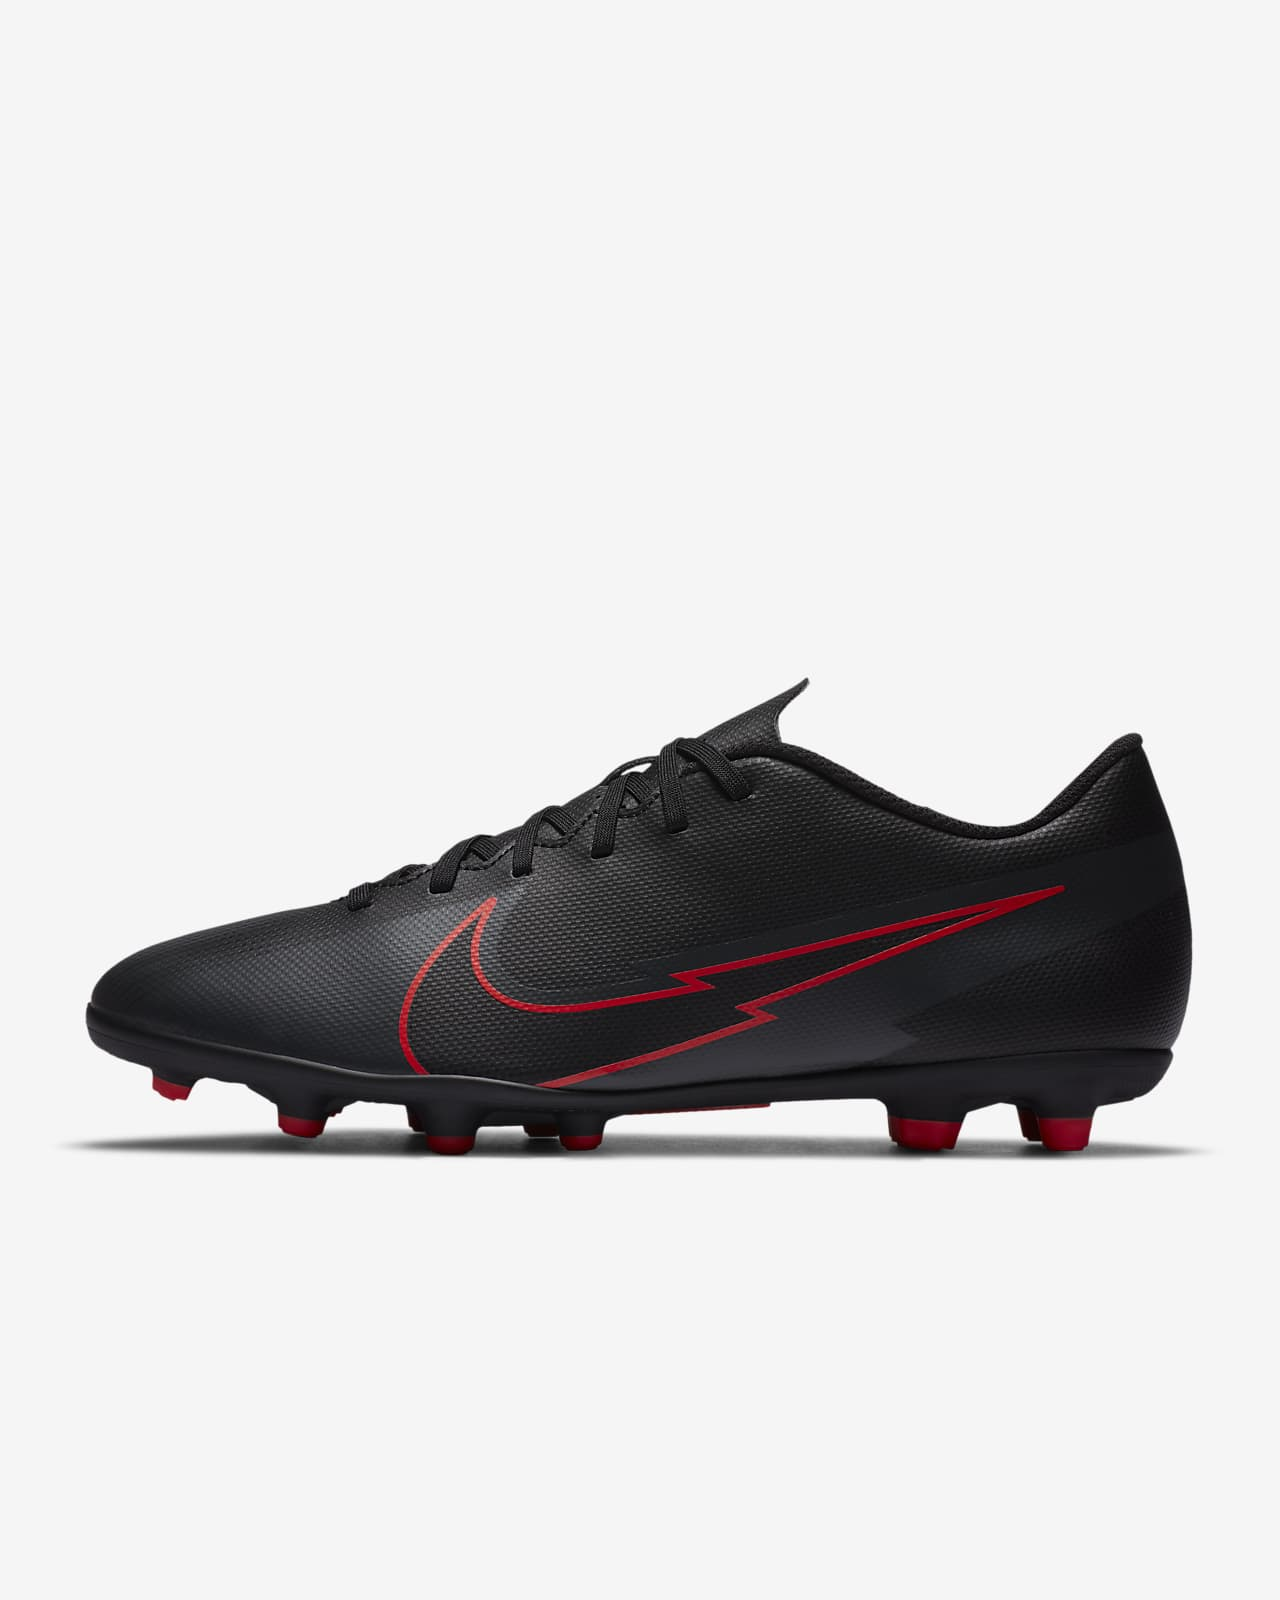 Chuteiras de futebol multiterreno Nike Mercurial Vapor 13 Club MG